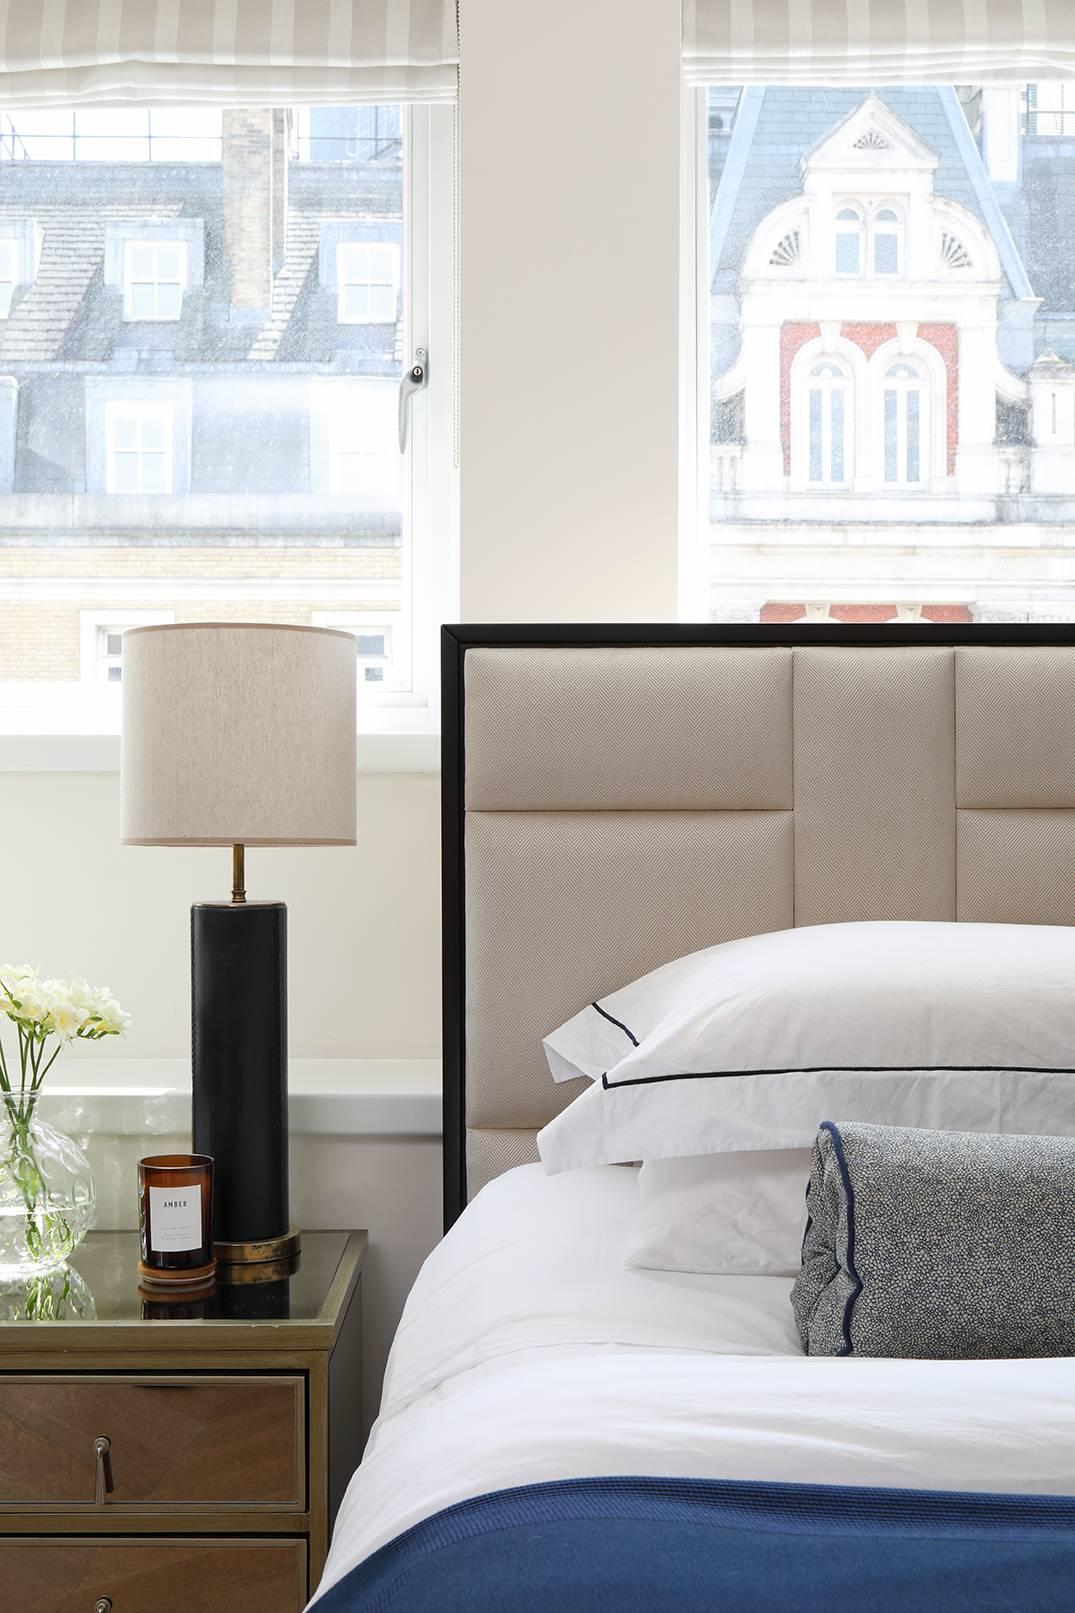 Covent Garden Interior Designed Apartment by Shanade McAllister-Fisher Design